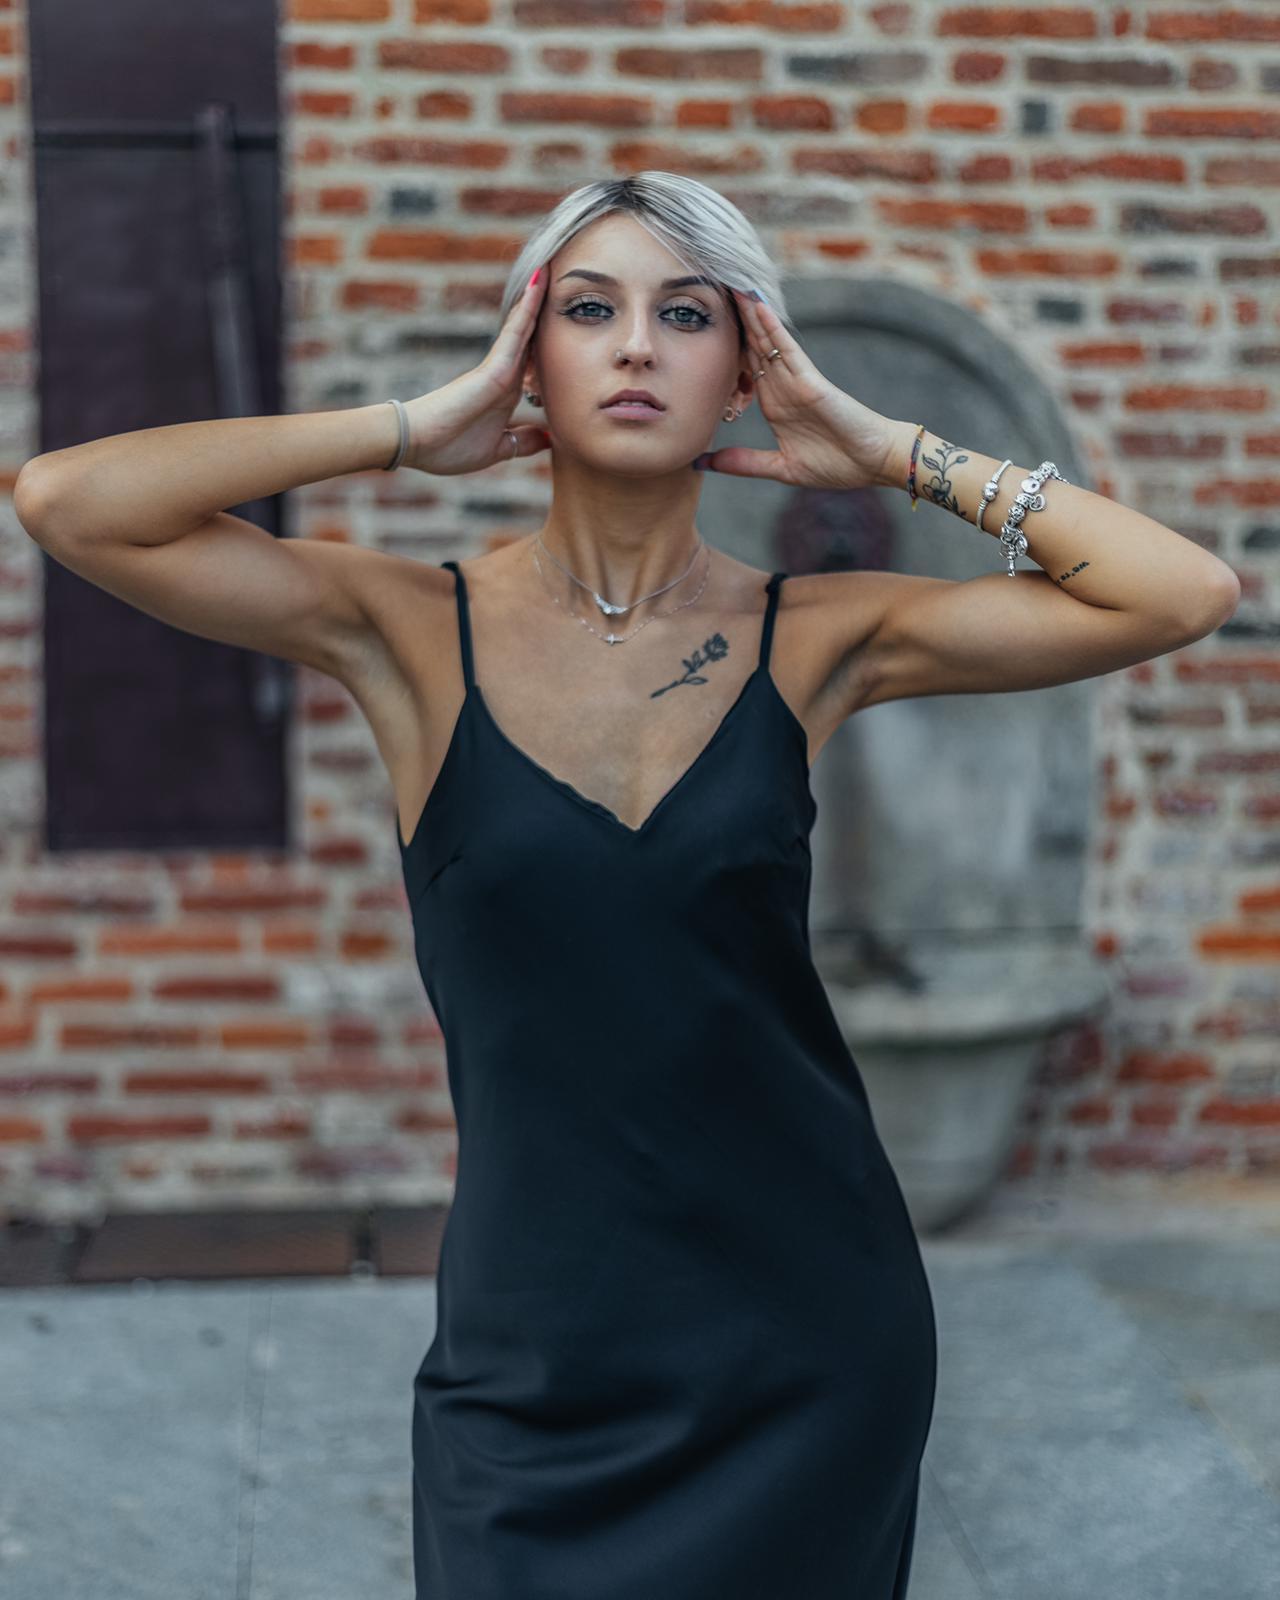 Categorie: Fashion, Glamour, Portrait - Photographer: CHRISTIAN ZINFOLLINO - Model: CATERINA CORONA (_caterinacorona_) - Location: Torino, TO, Italia